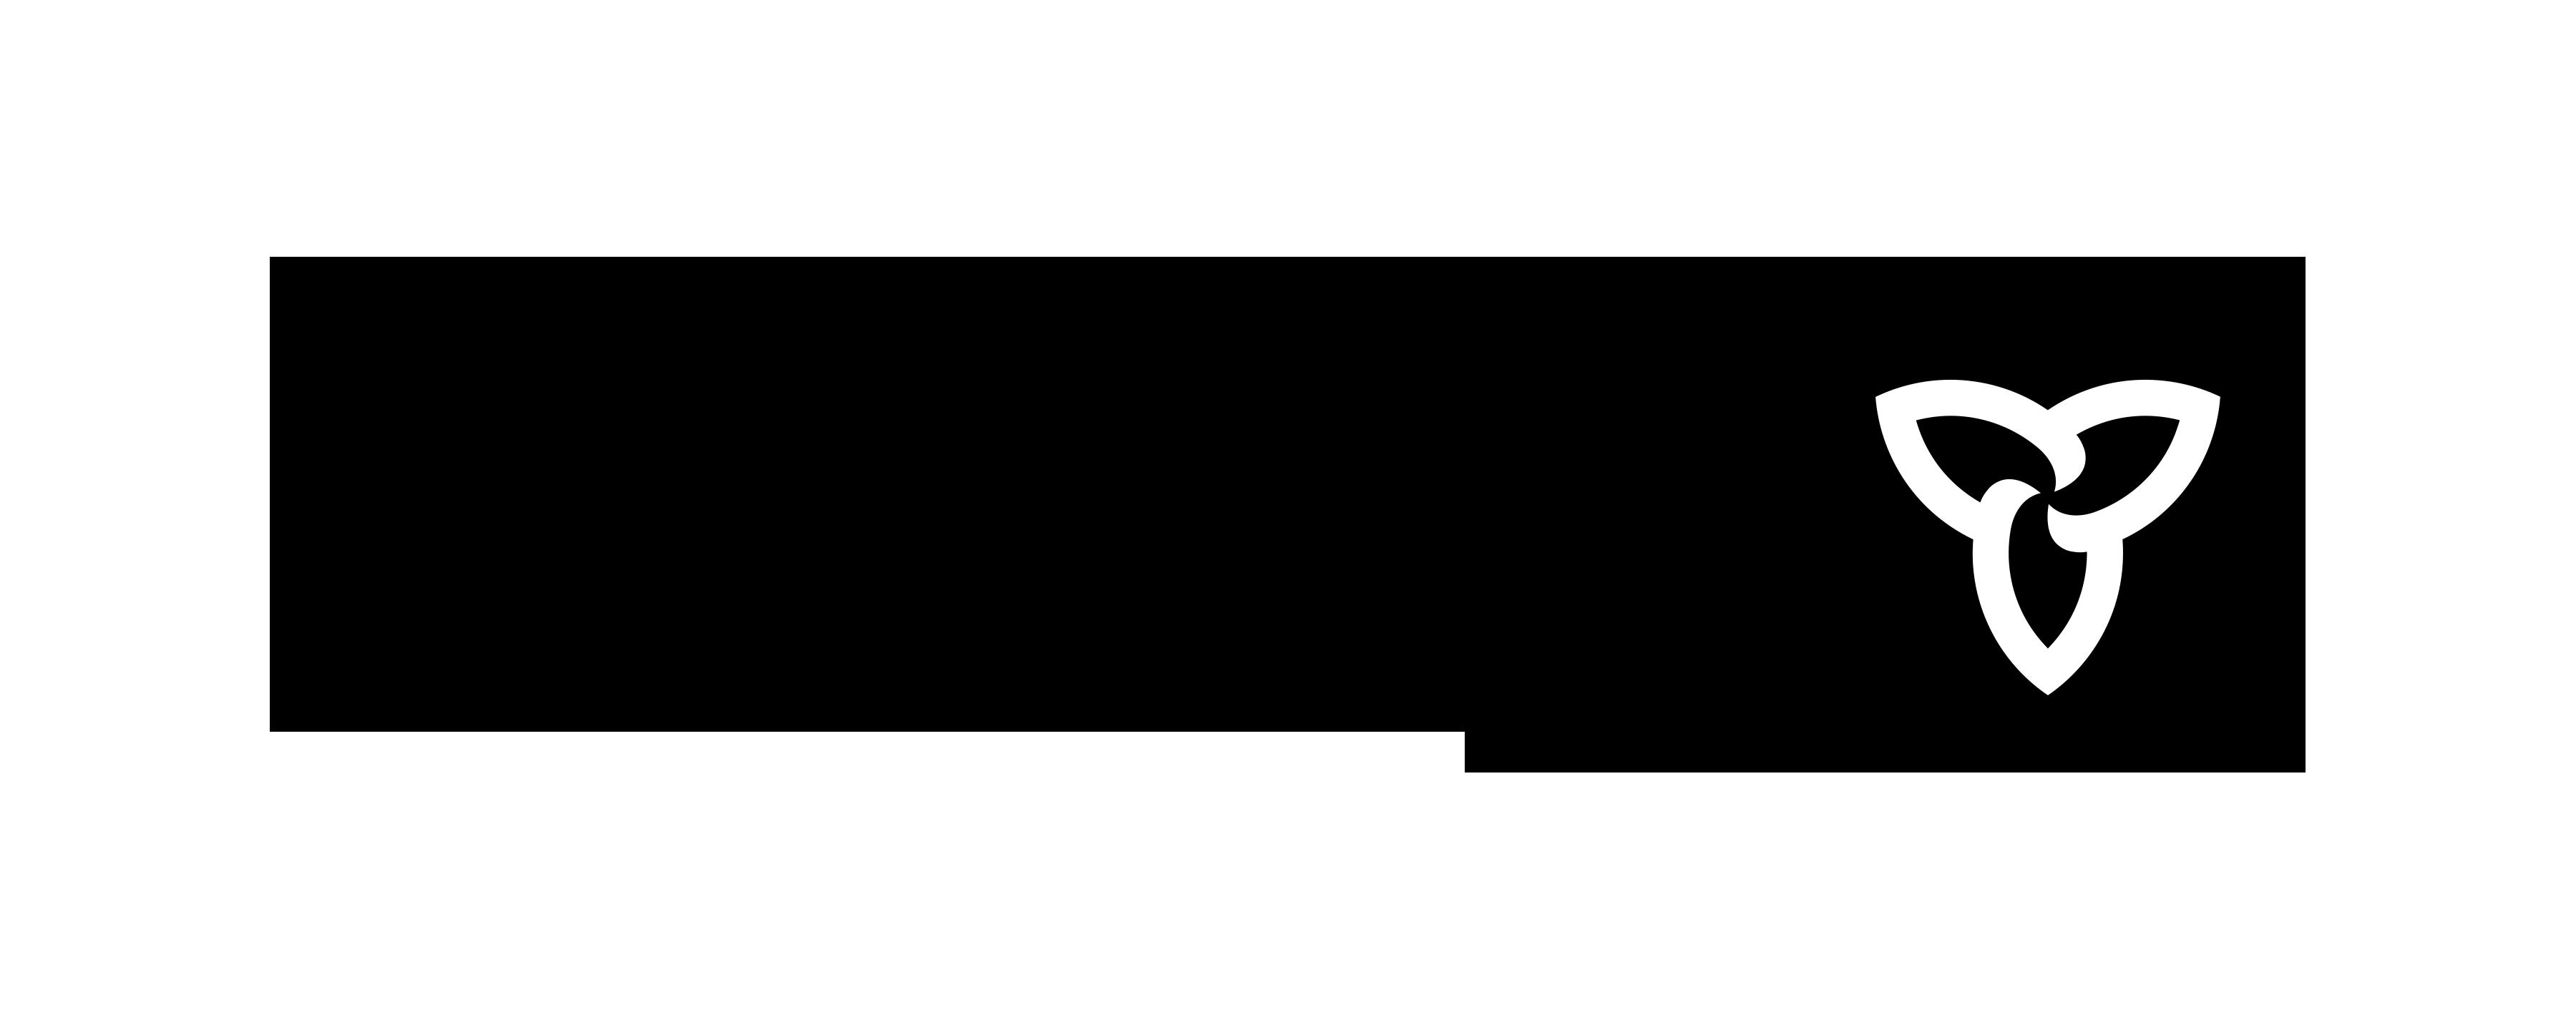 Gov of Ontario logo